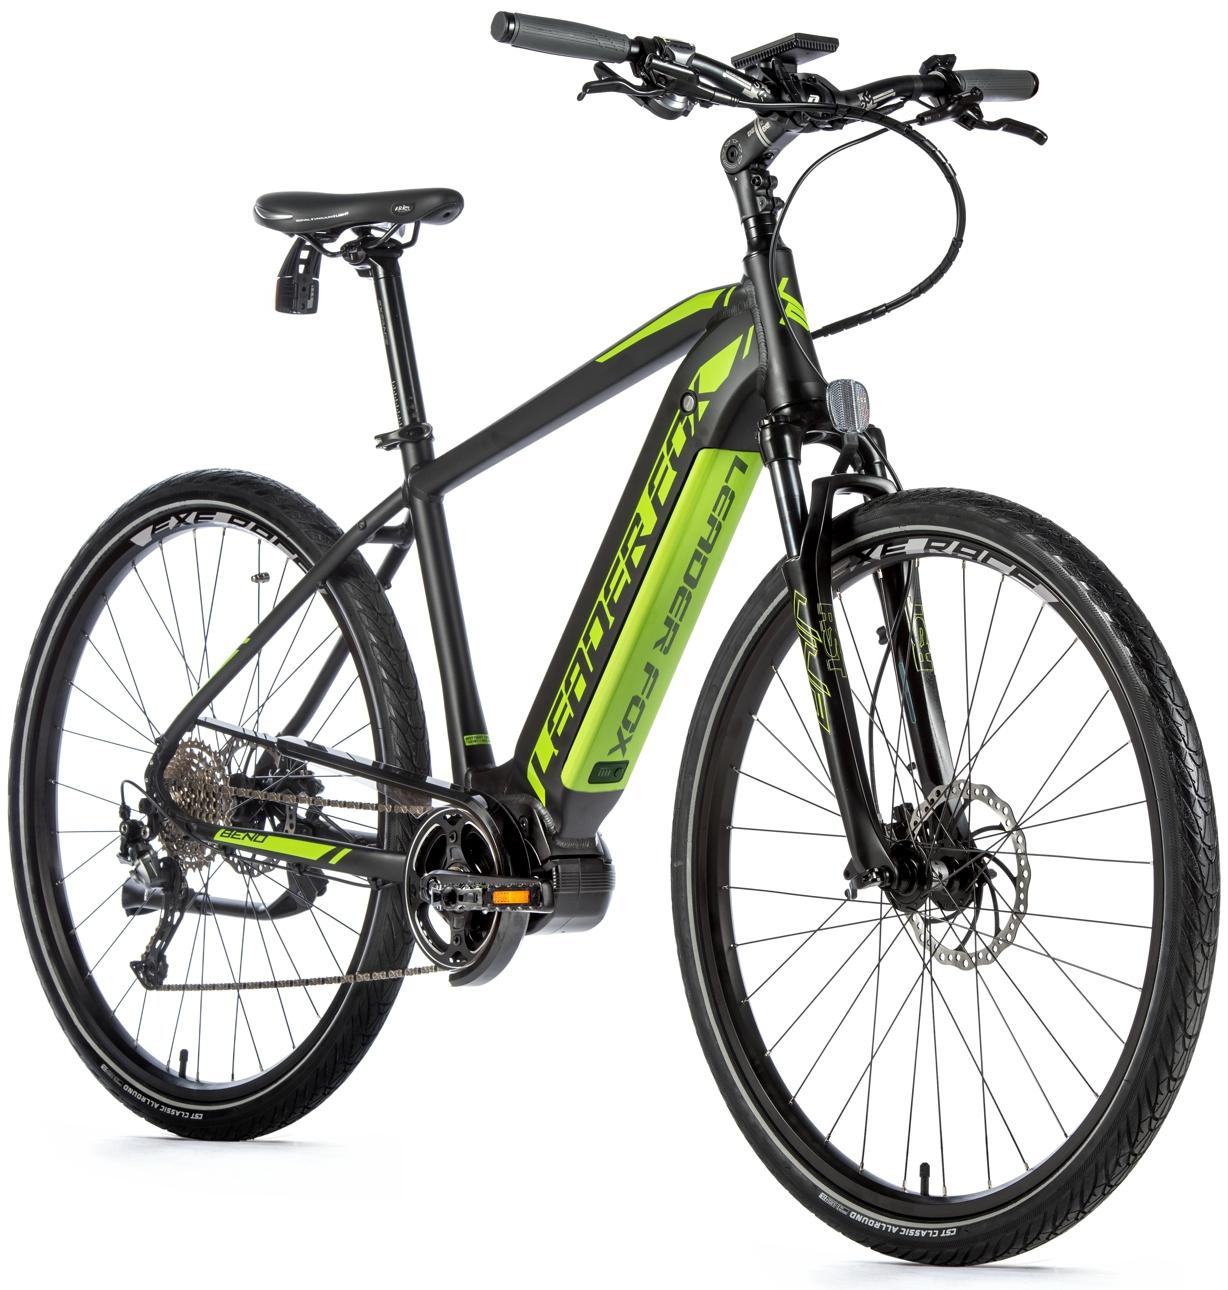 Bicicleta electrica City Leader Fox Bend Gent, 2020